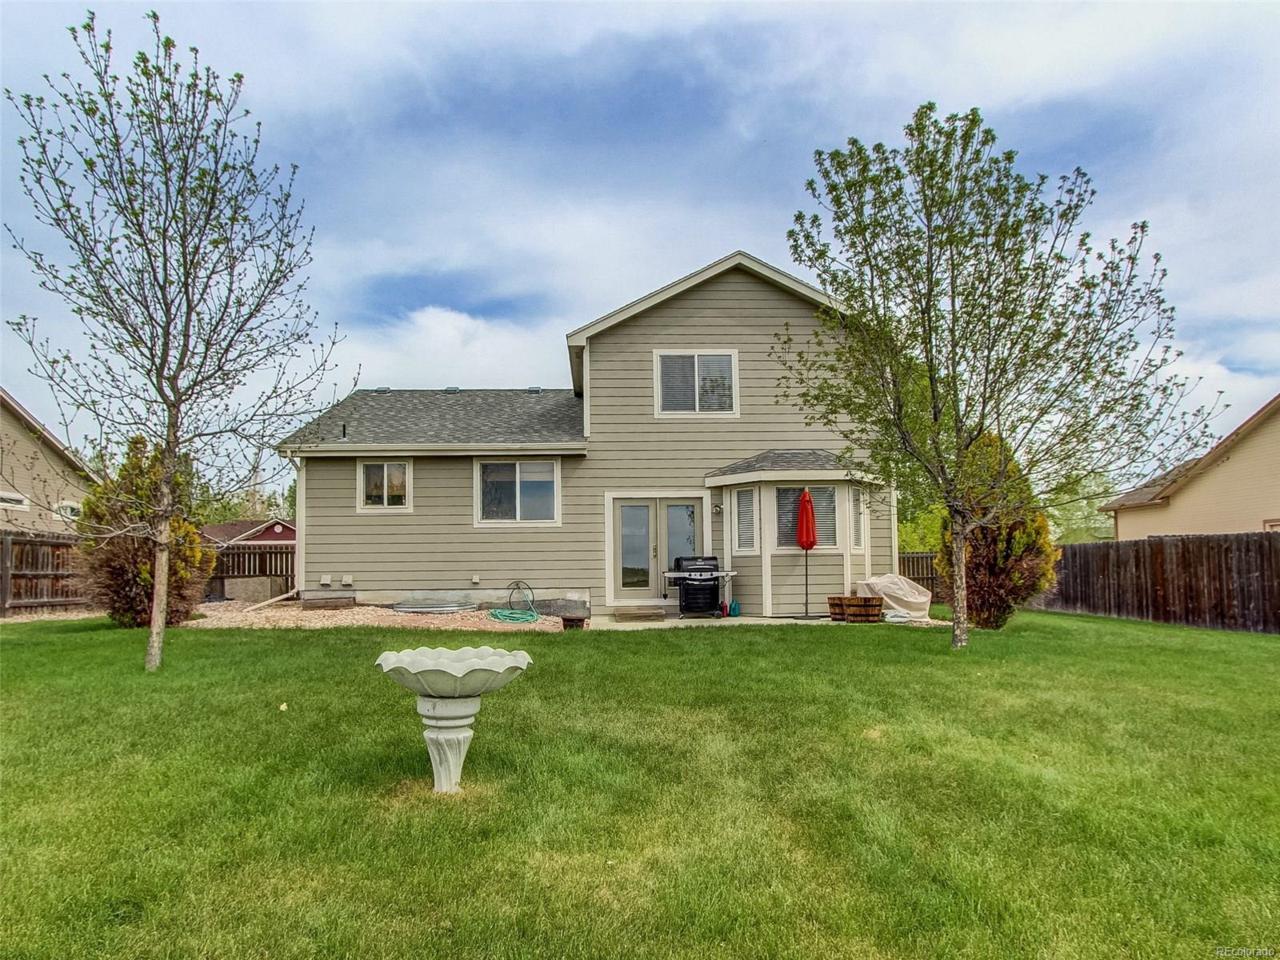 130 Eagle Avenue, Mead, CO 80542 (MLS #4878755) :: 8z Real Estate